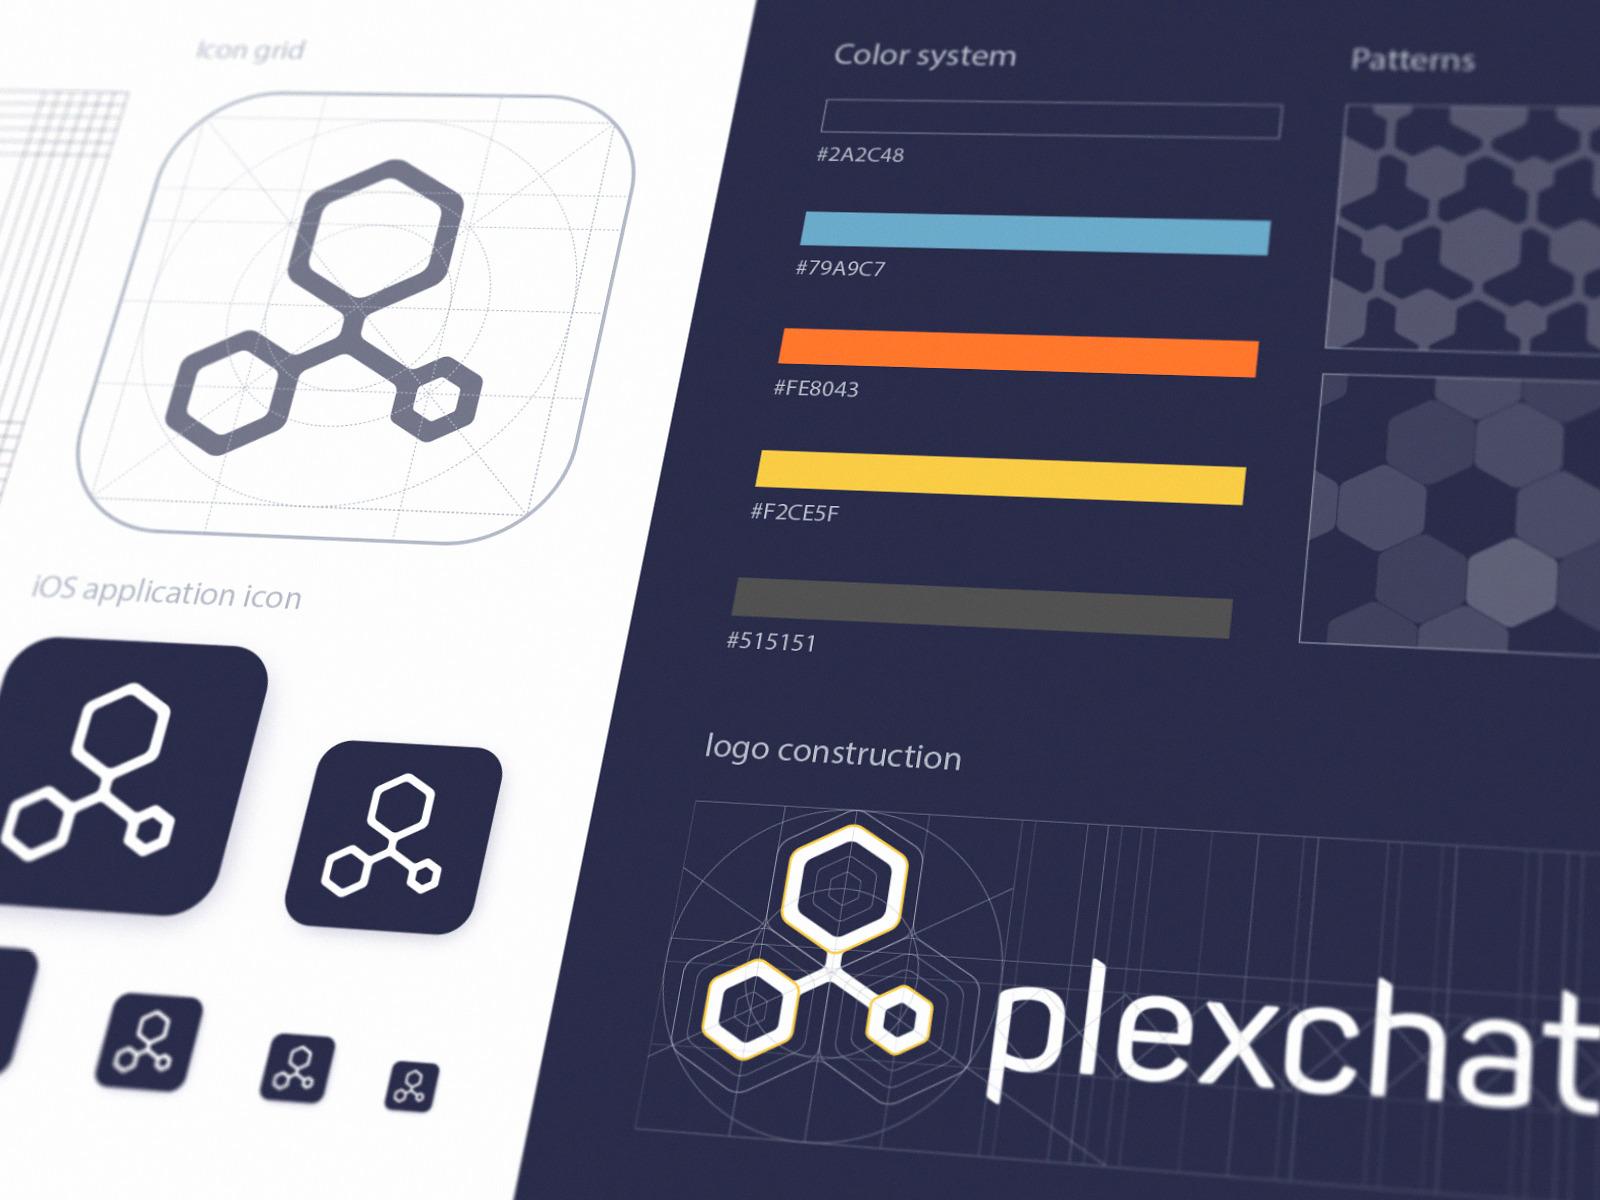 plexchat guidelines